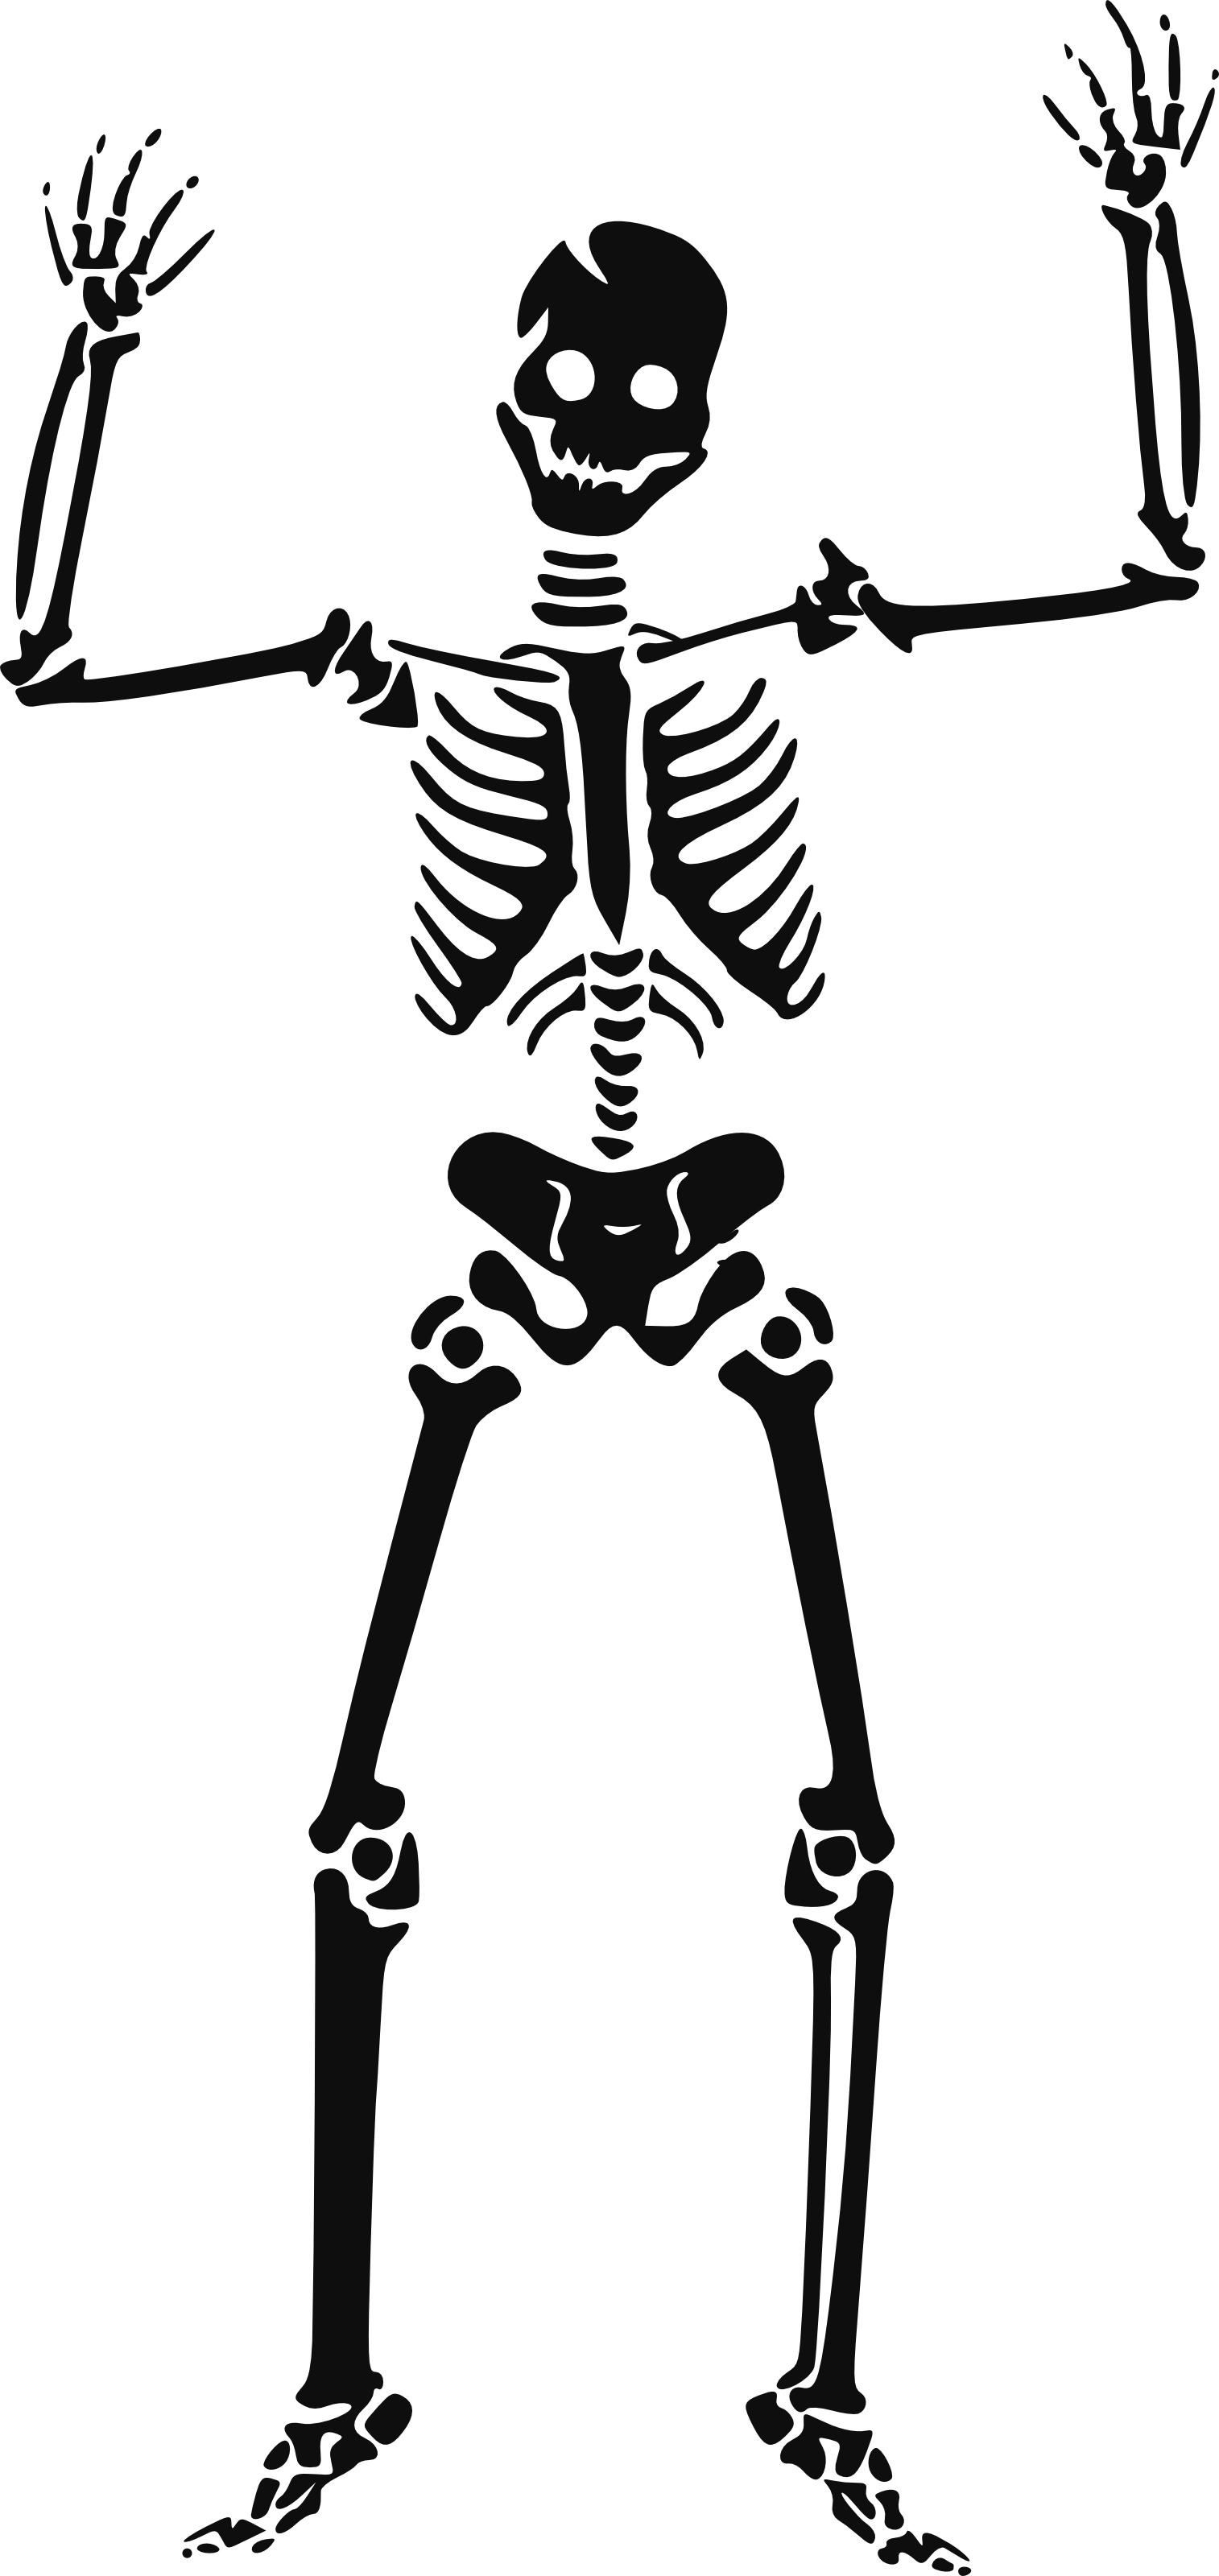 Skeleton clipart #11, Download drawings